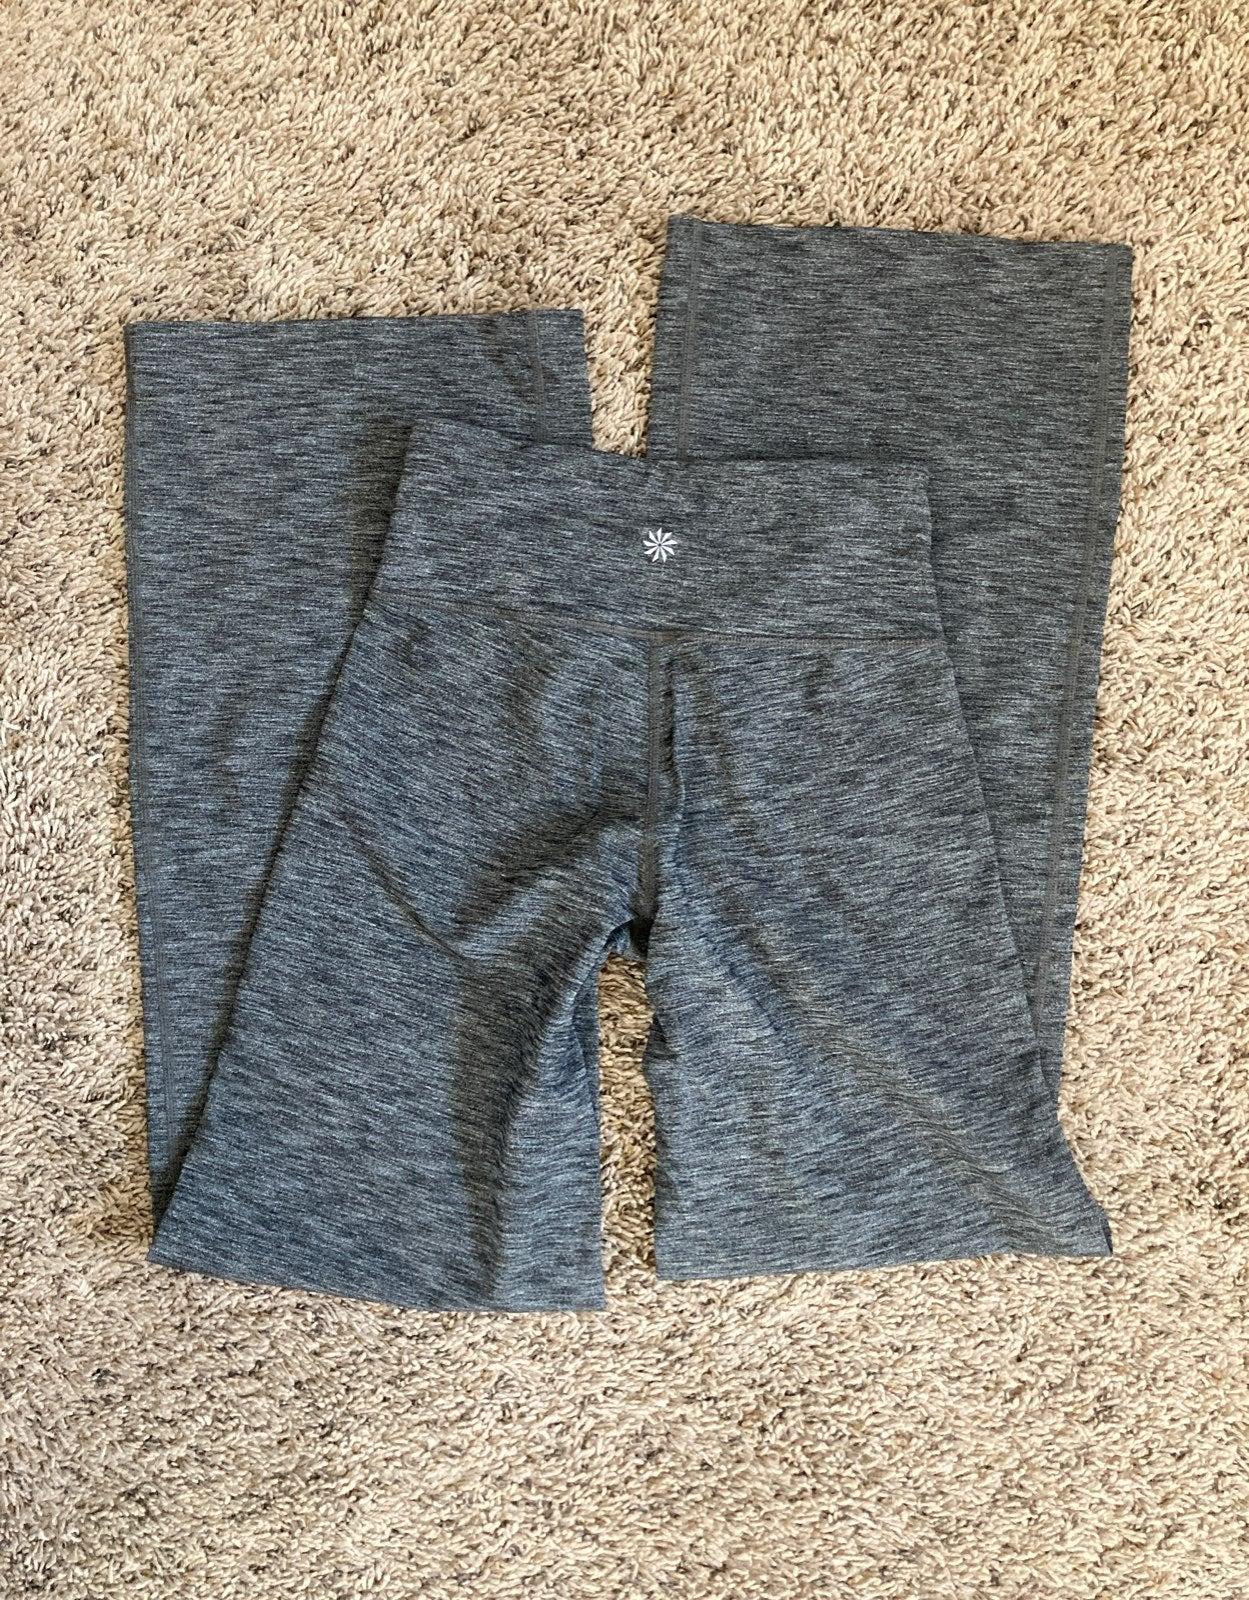 Athleta Yoga Pants chats XS